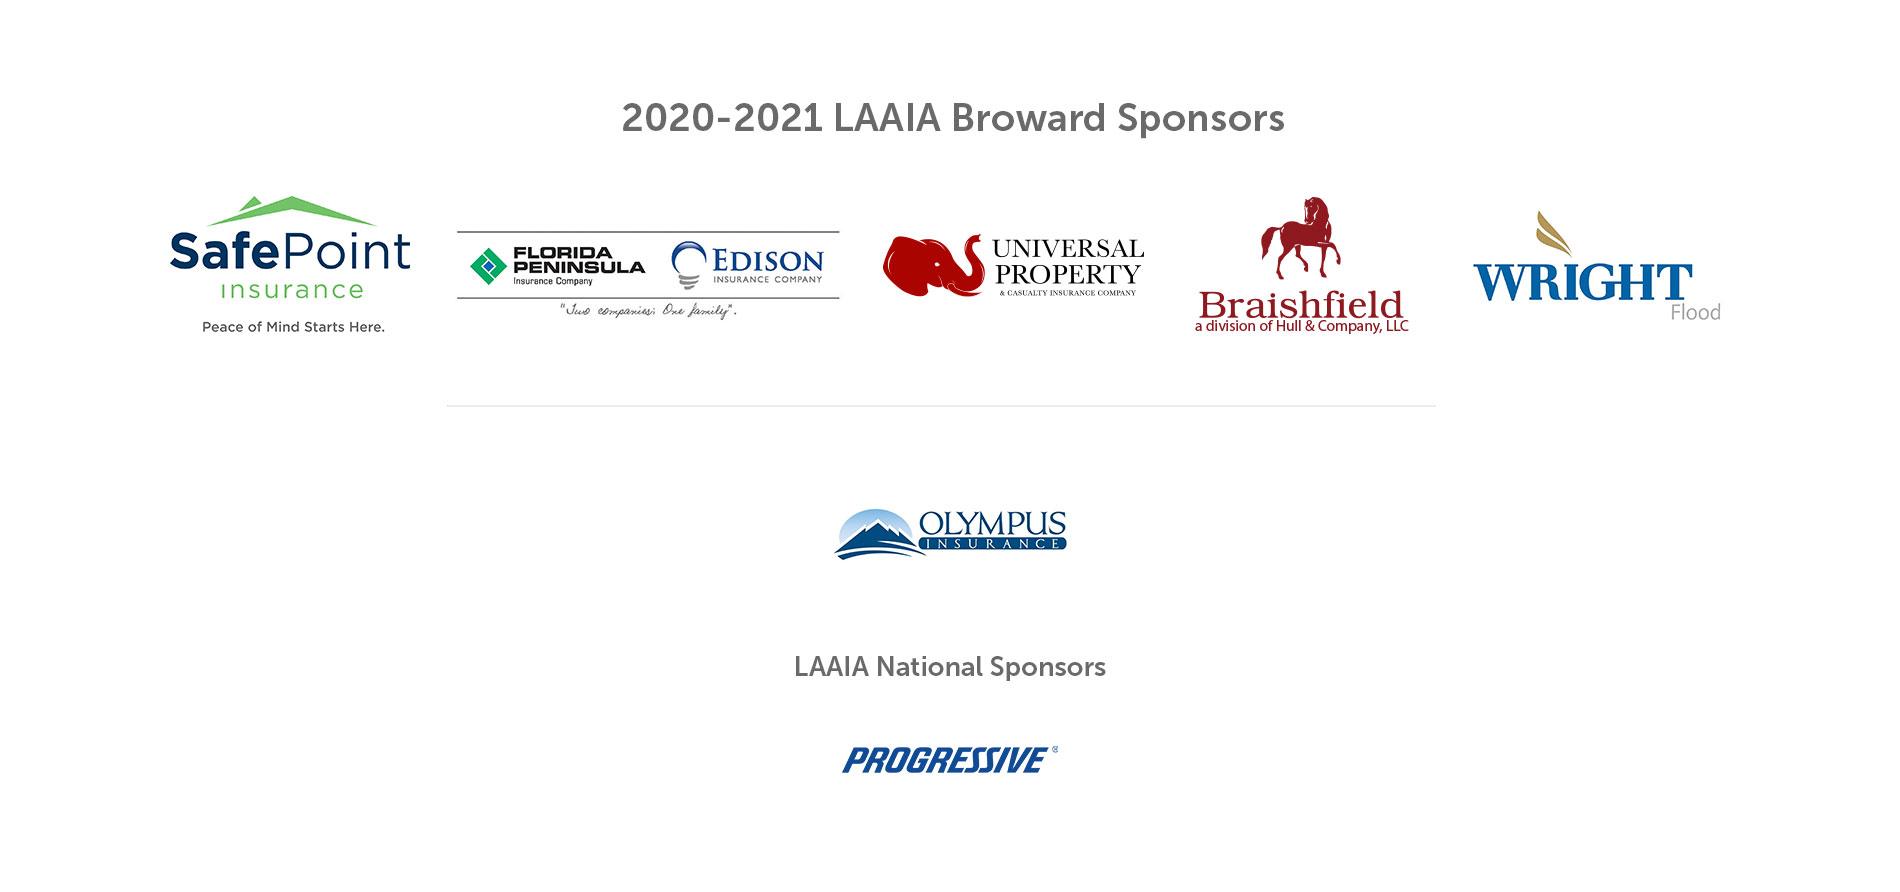 2019 2020 sponsors